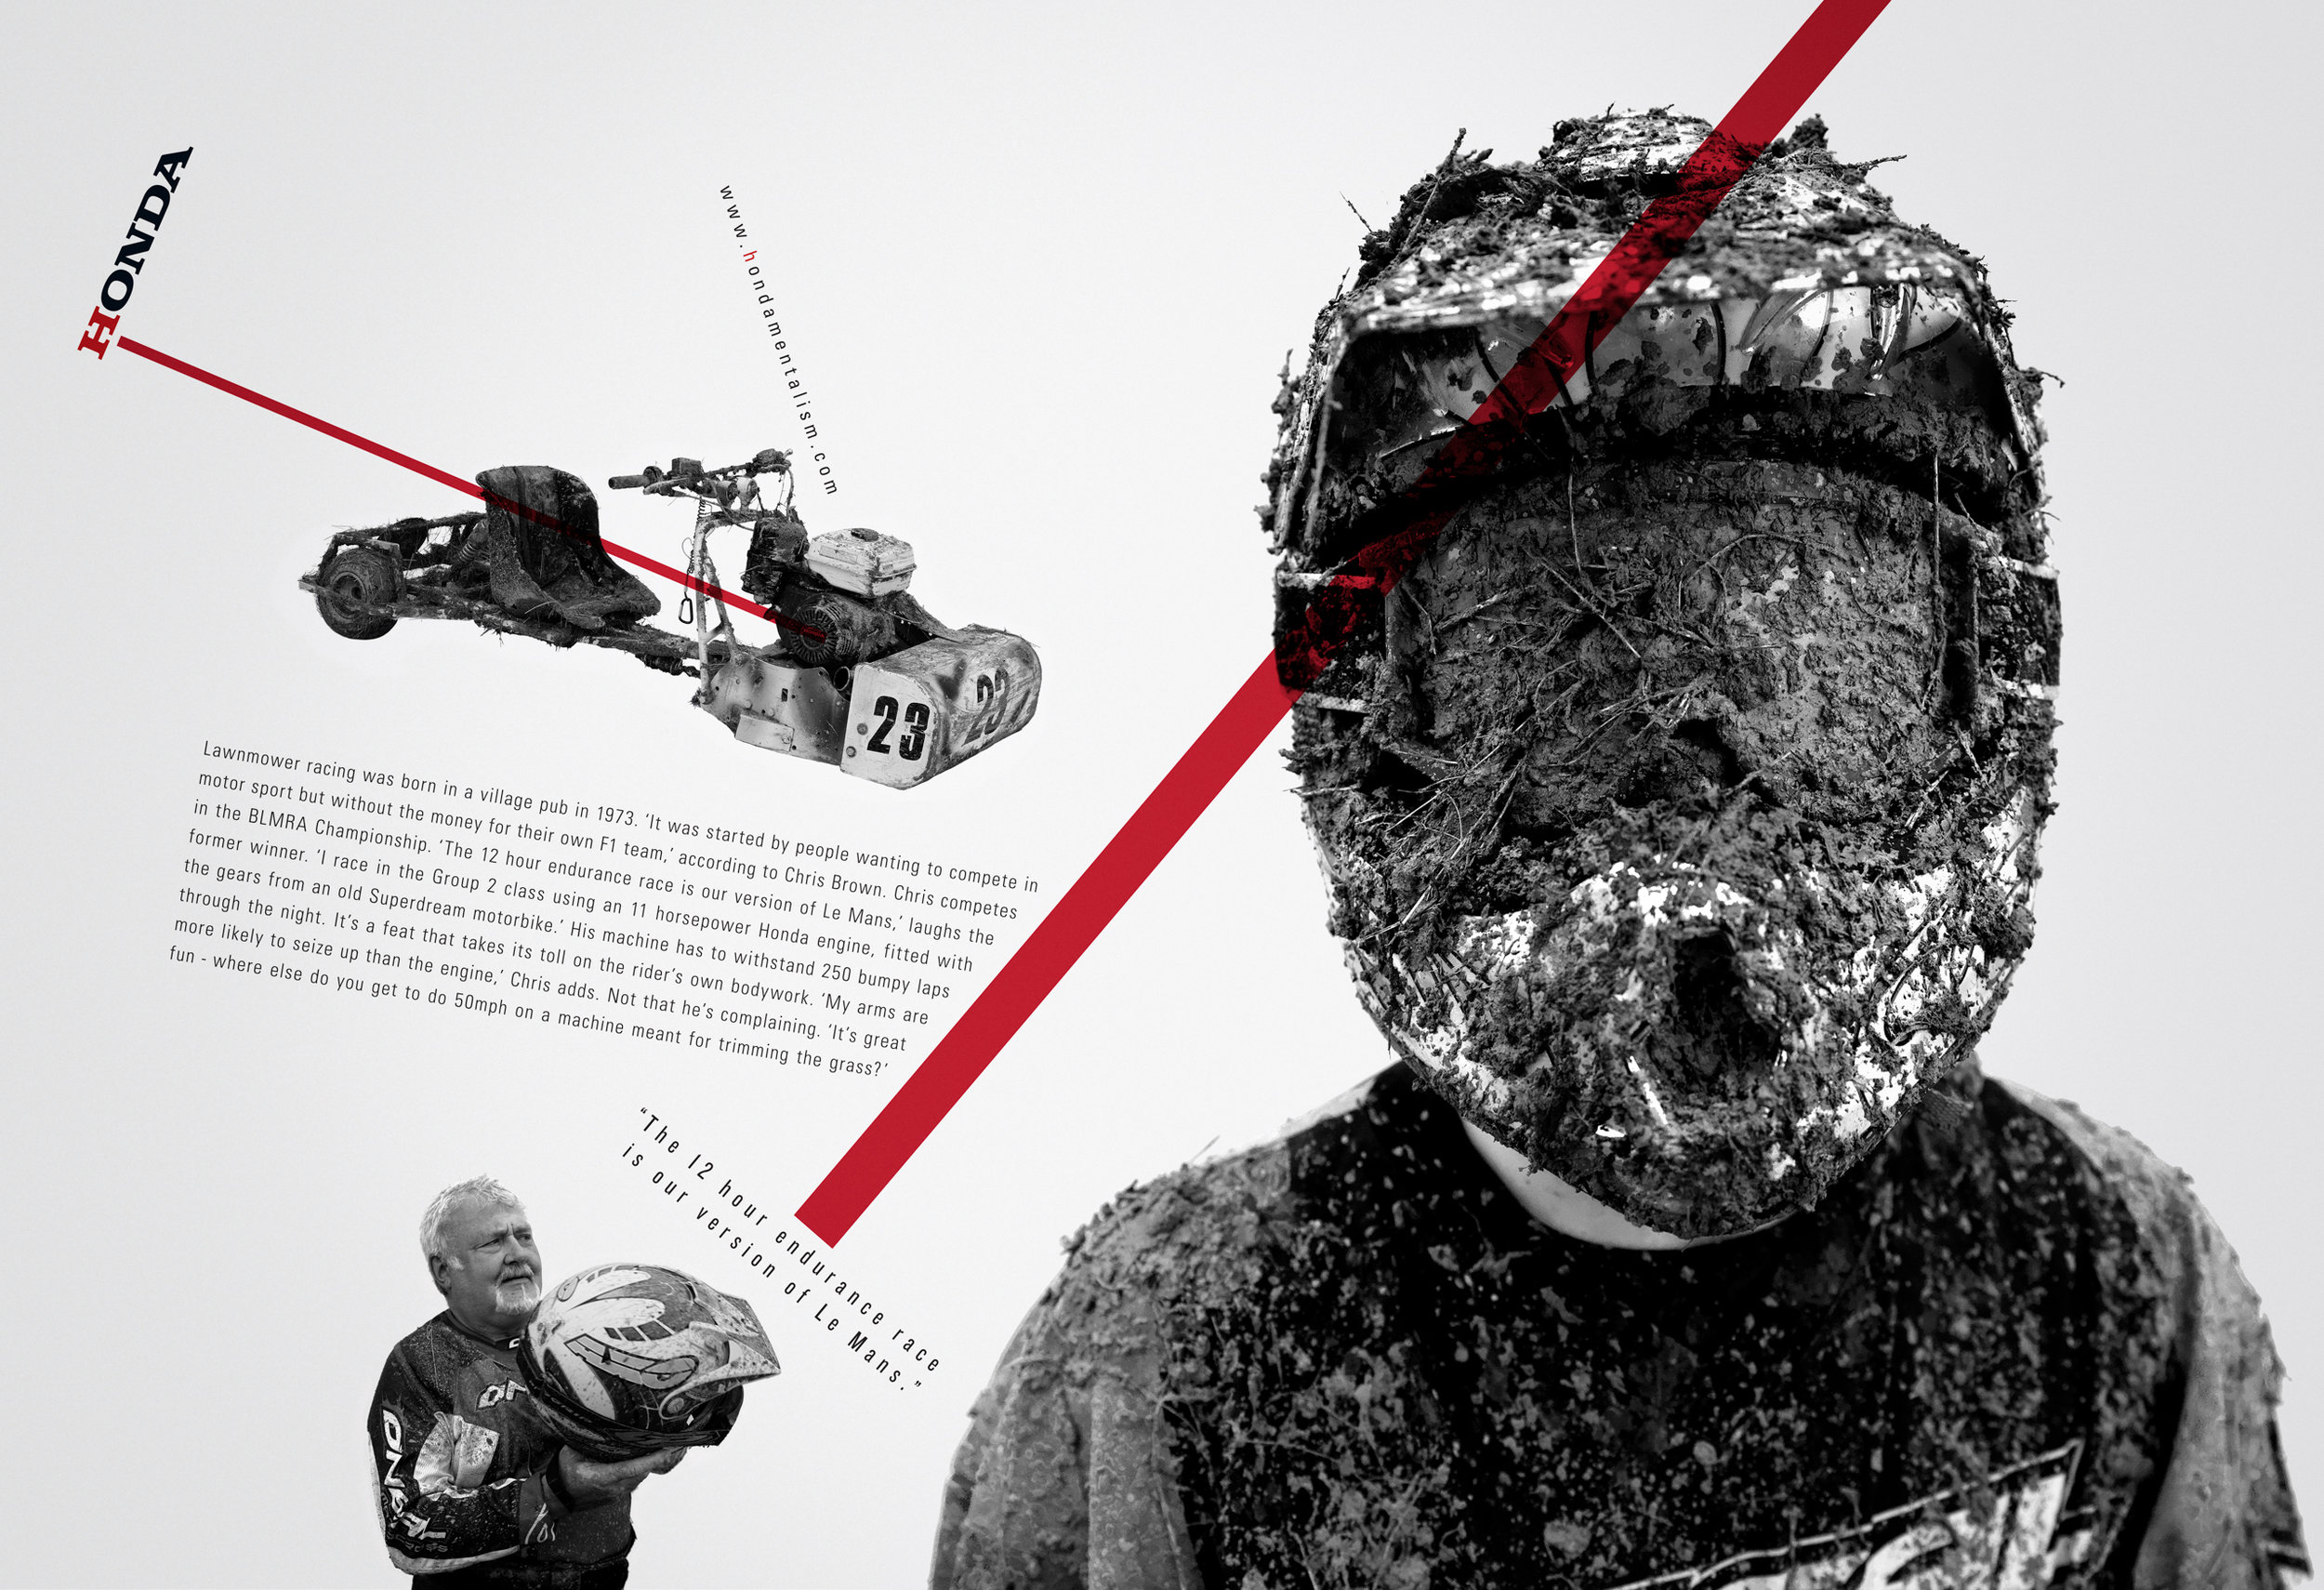 Honda Mentalism, Weiden + Kennedy